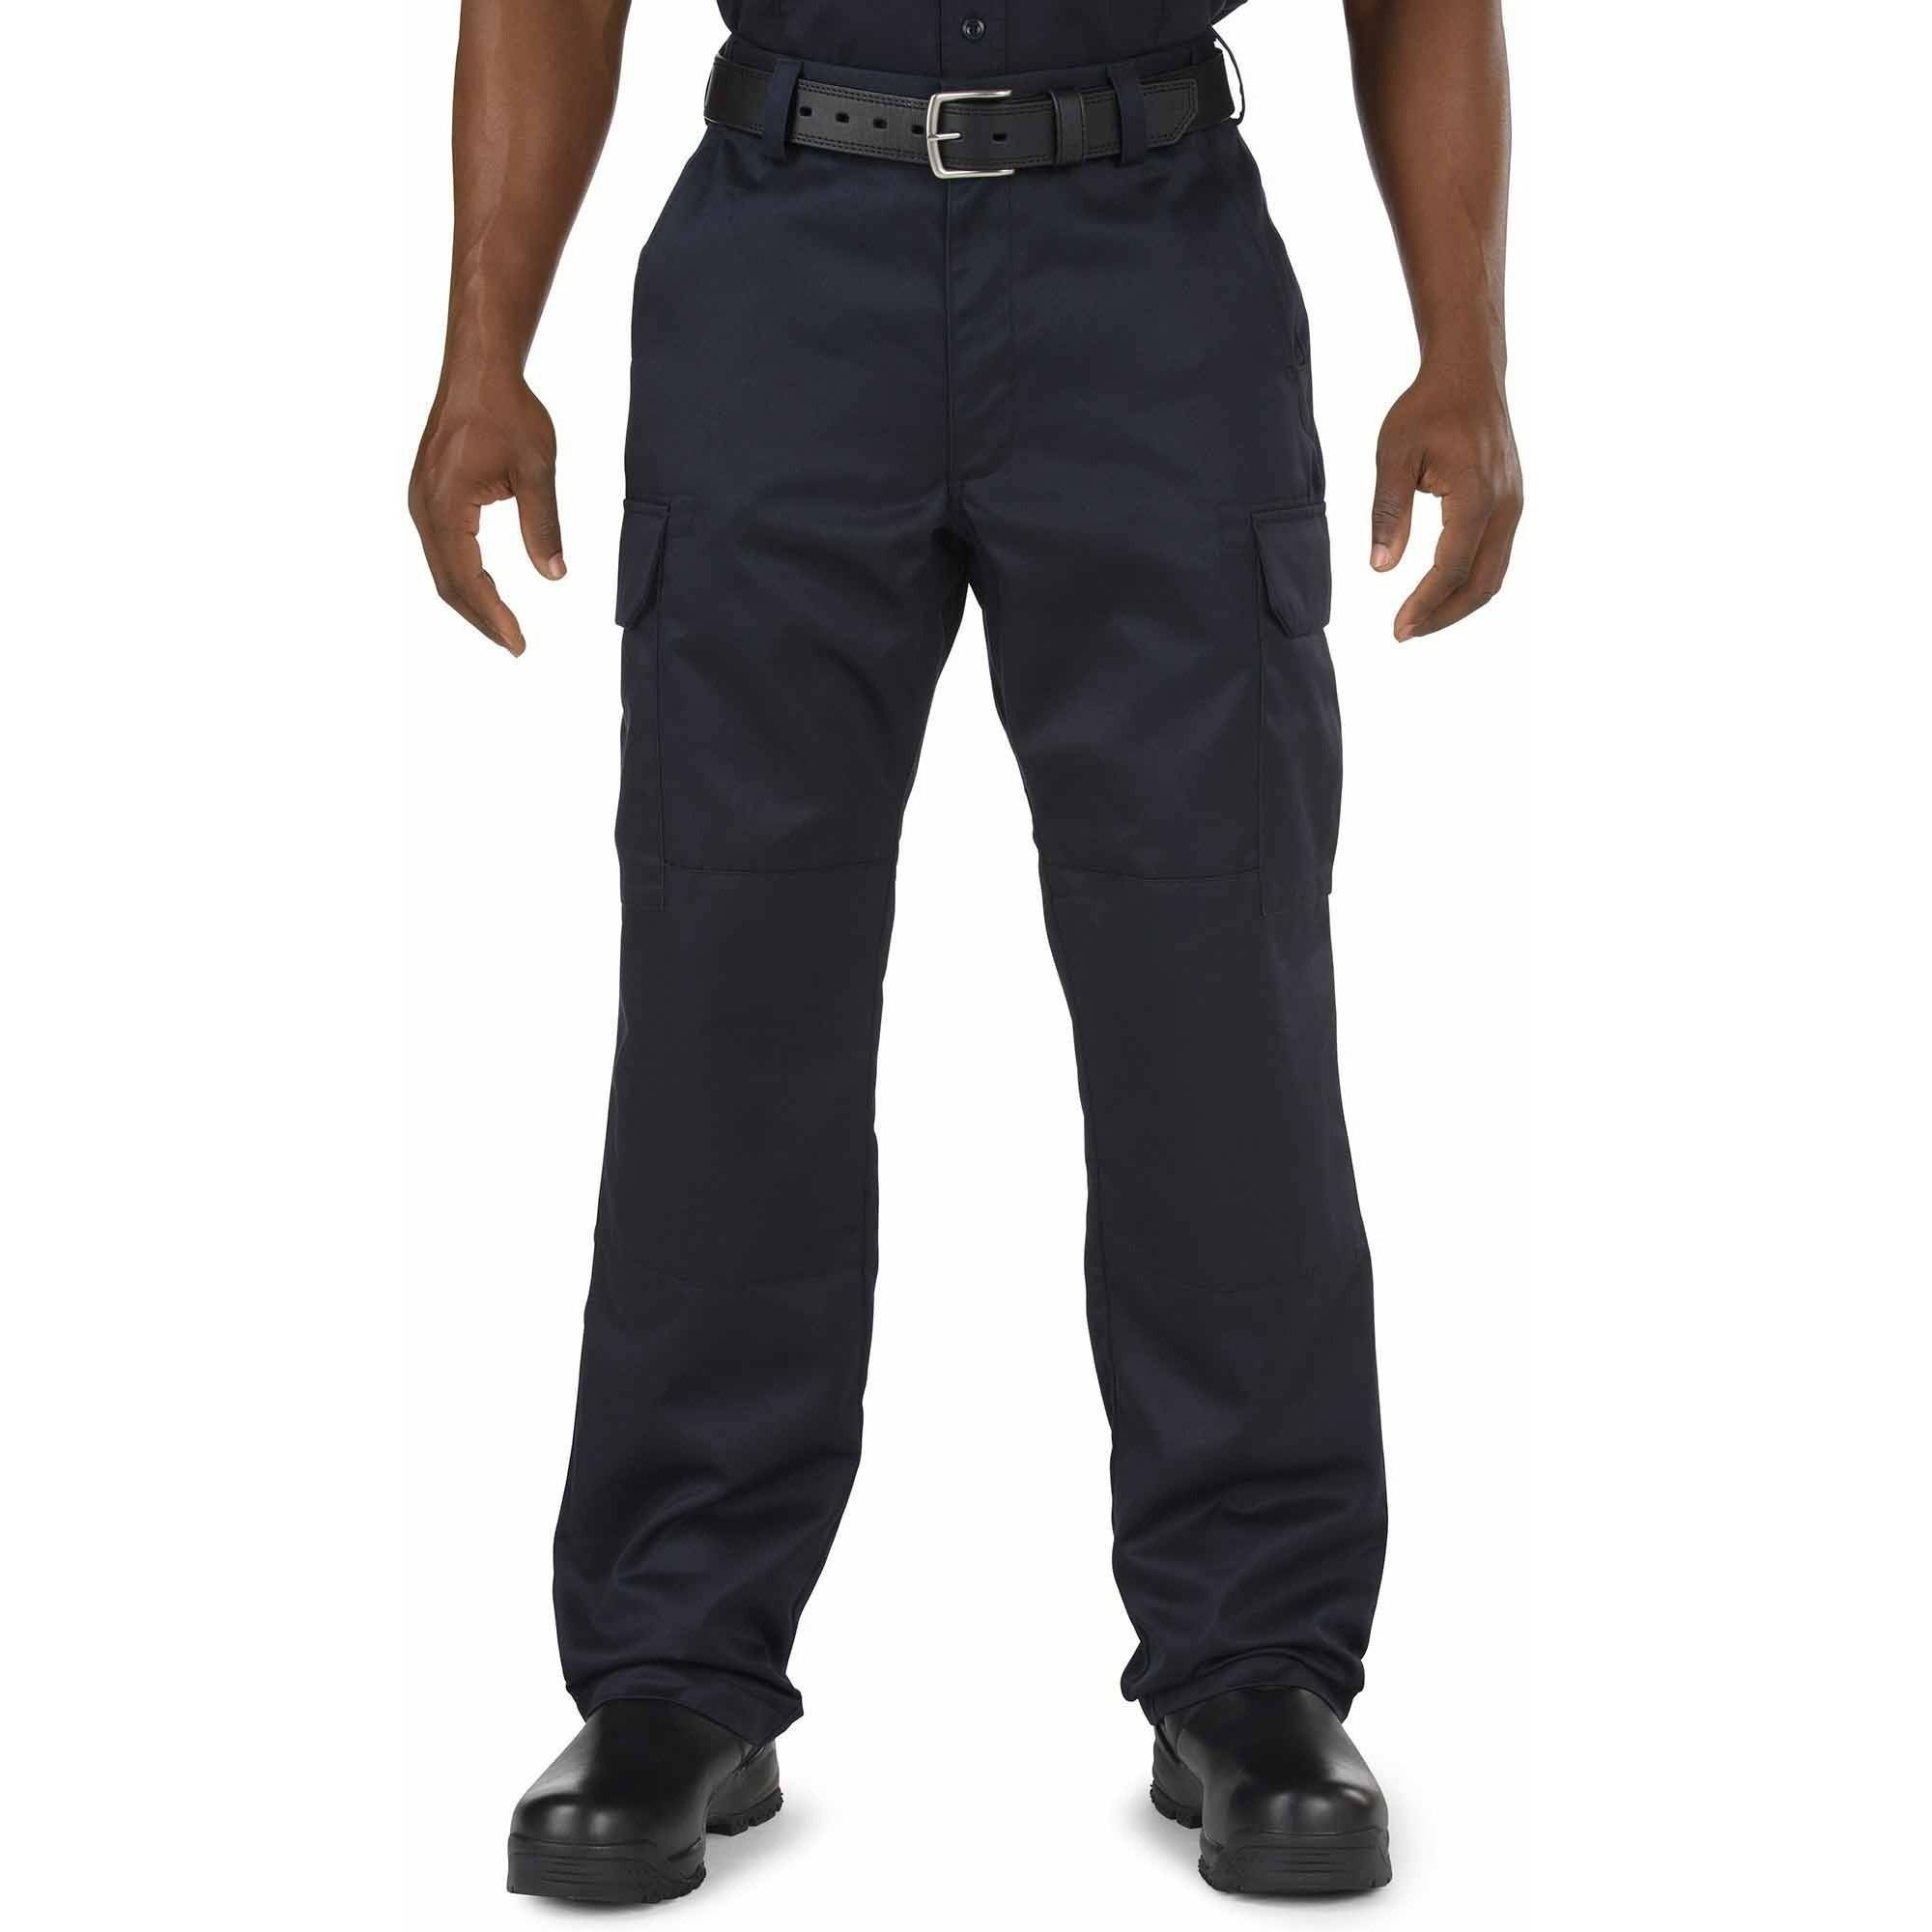 5.11 Tactical Men's Company Cargo Pant, Fire Navy